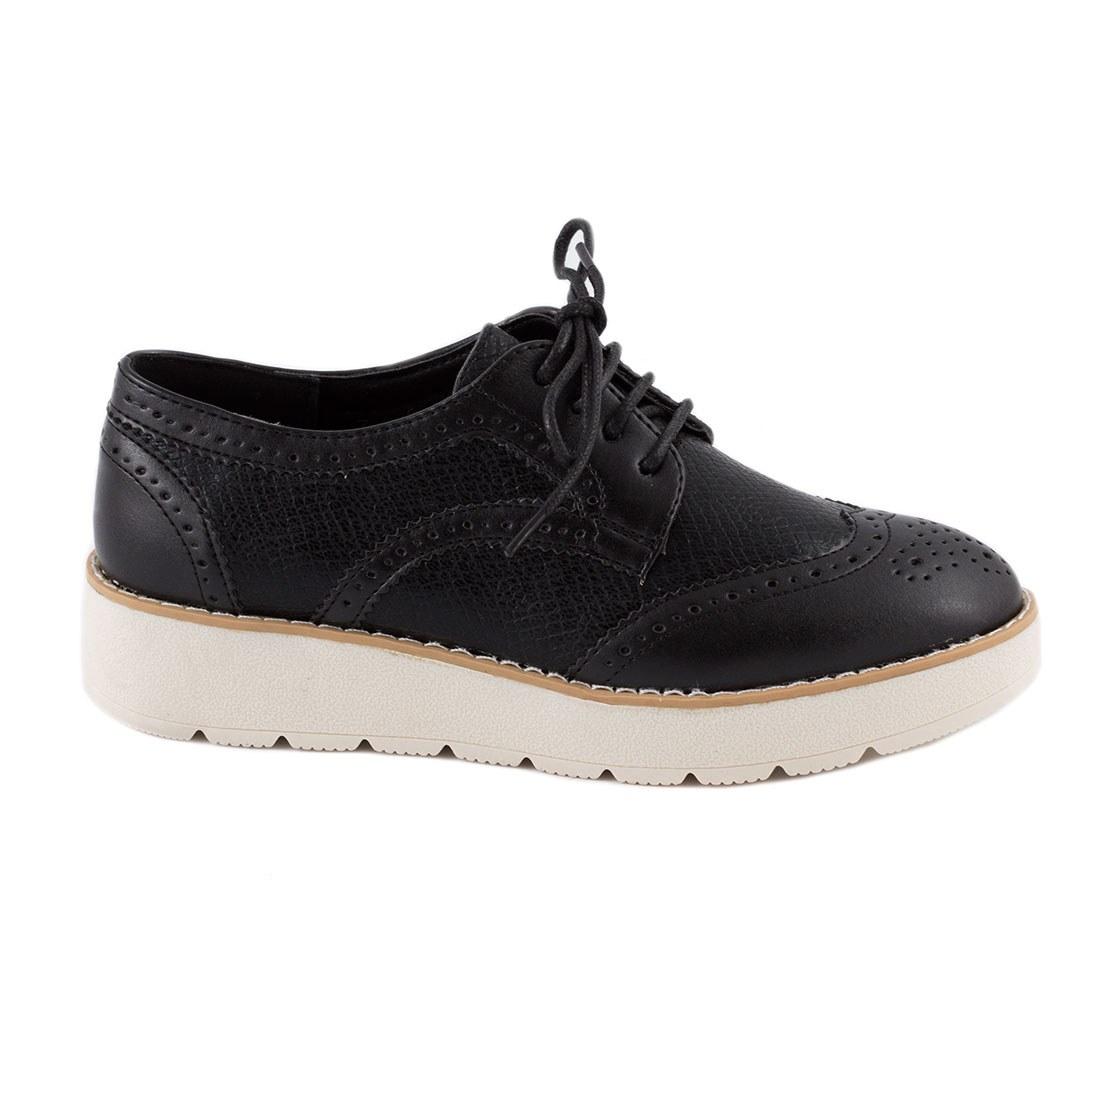 Pantofi dama cu siret 7-890-NEGRU